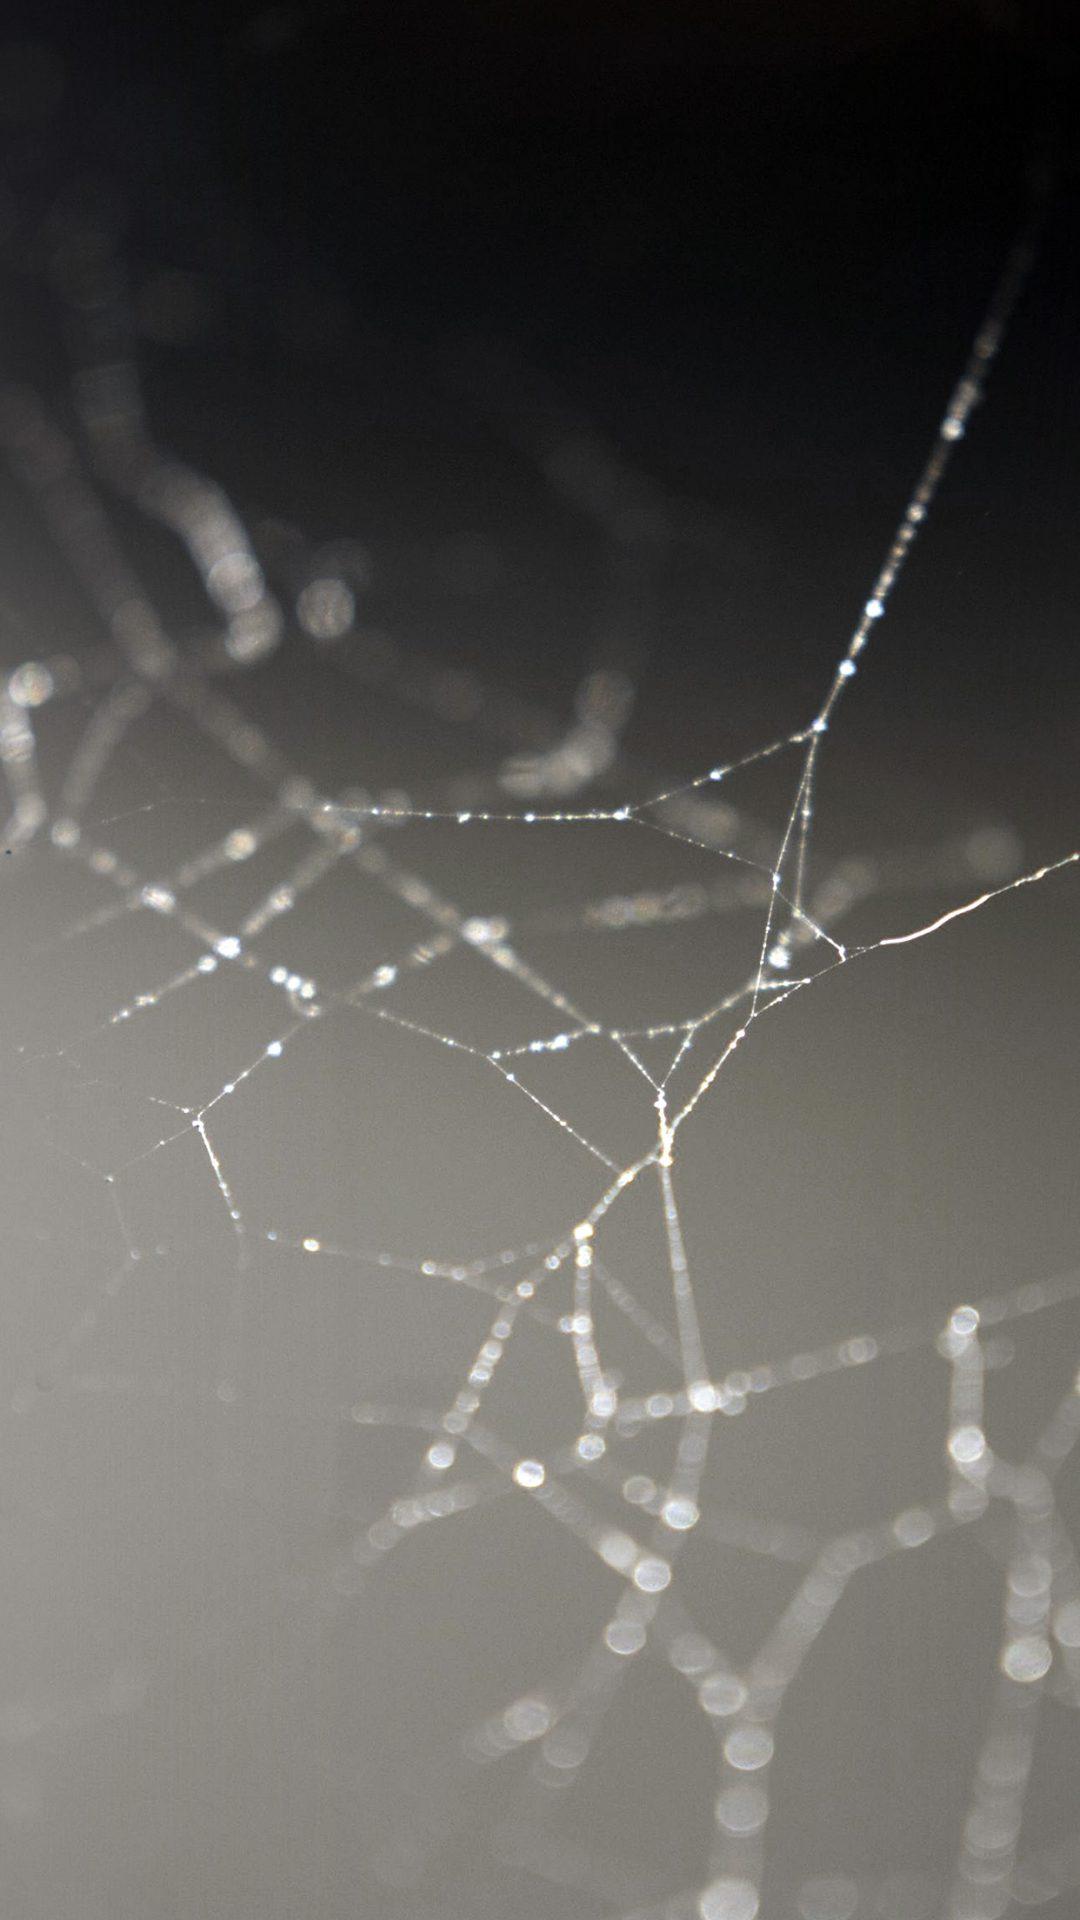 Spider Web Nature Rain Water Pattern Bw